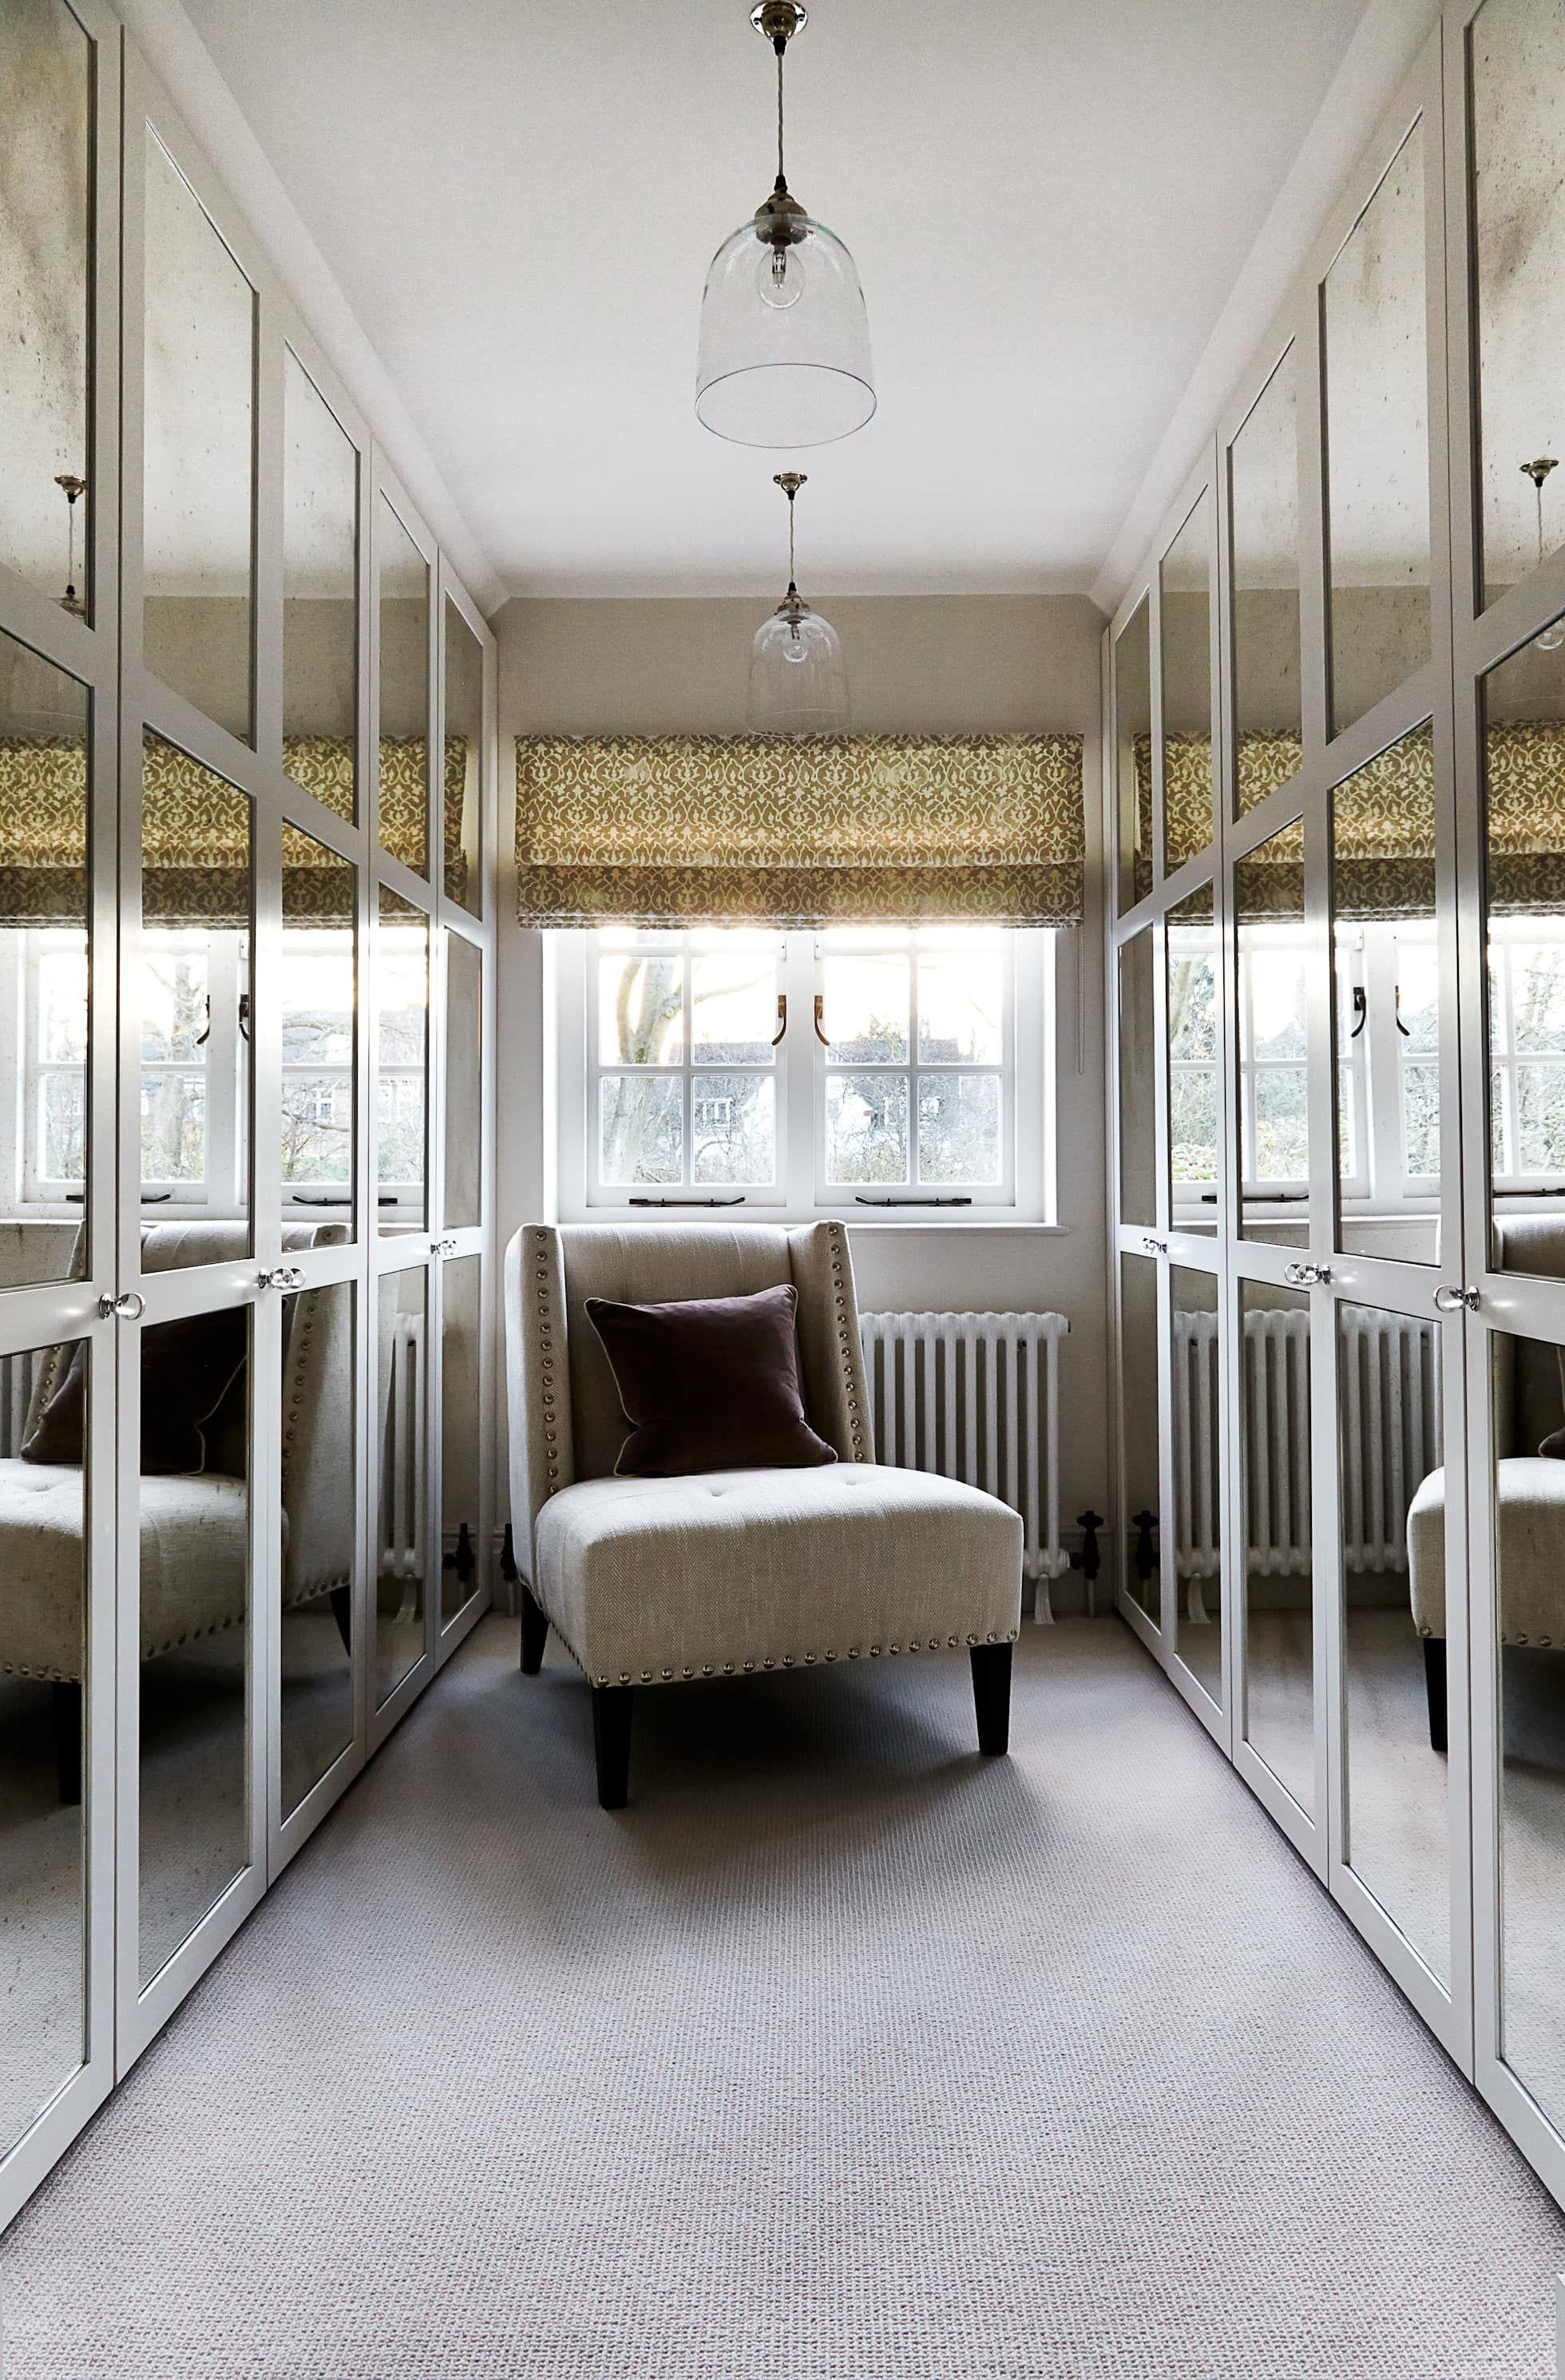 The Ranchalow Dressing Room Reveal In 2020 Living Room Mirrors Floor Length Mirror Floor Mirror